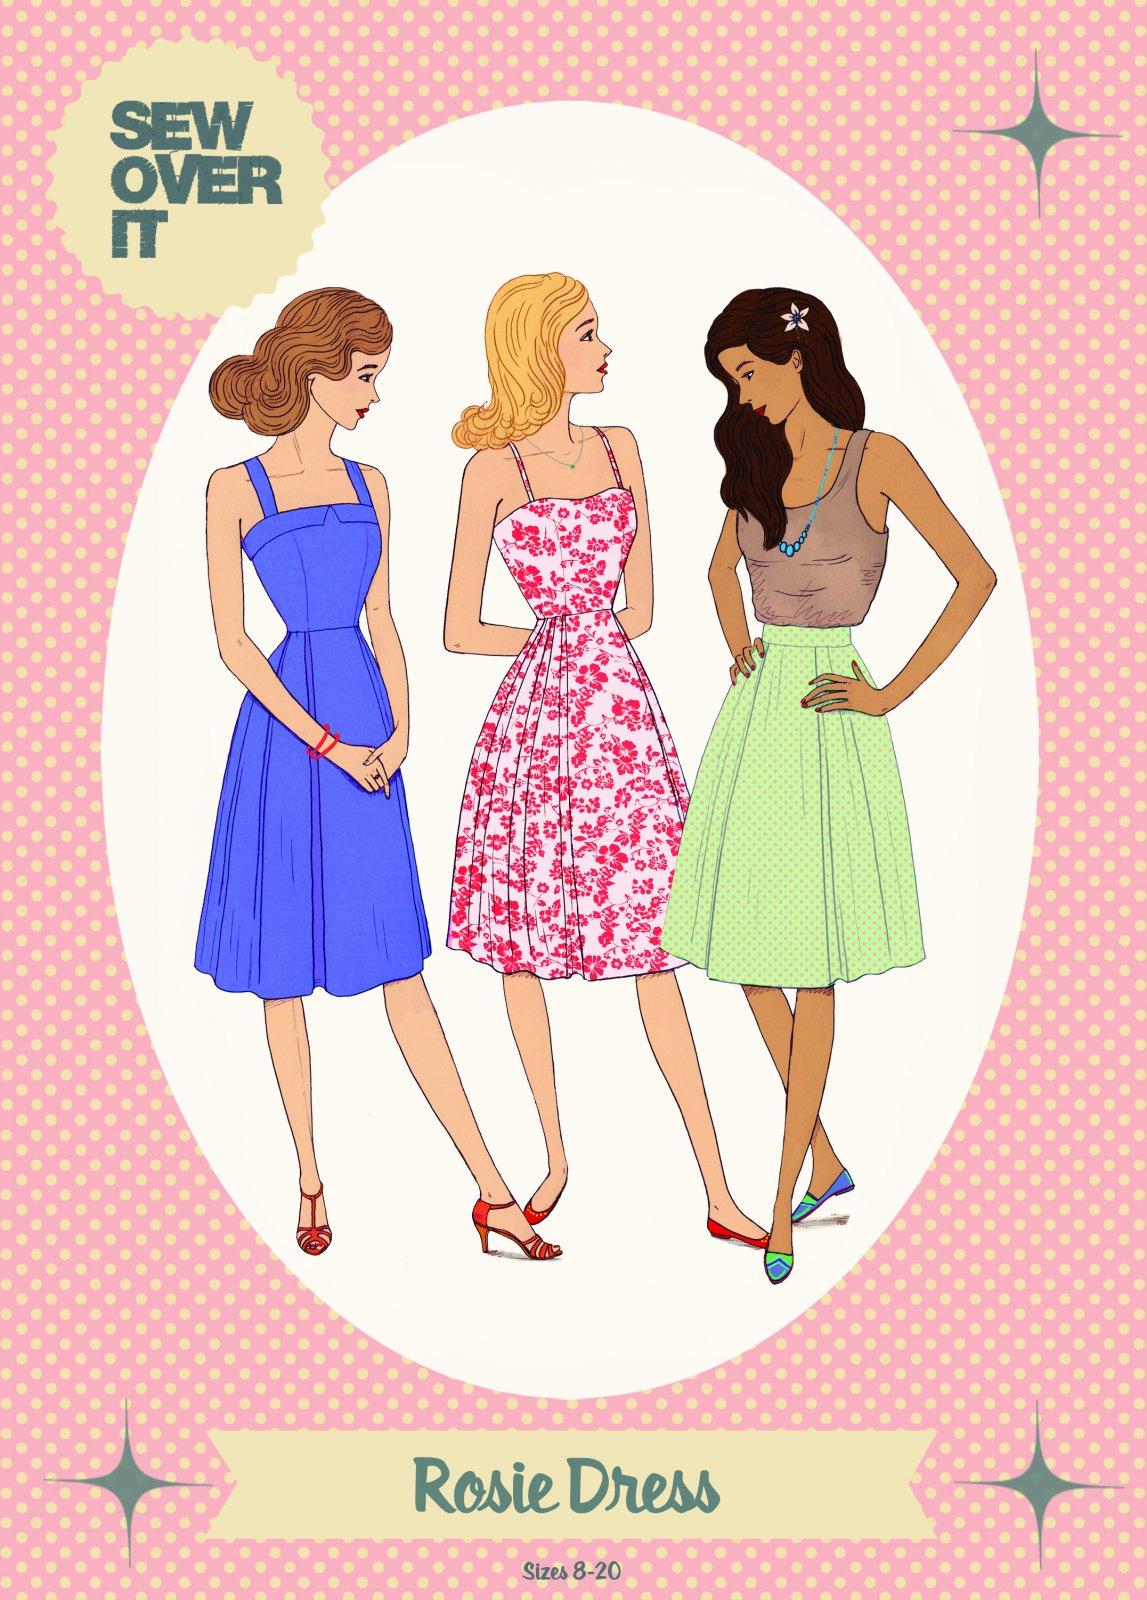 Sew Over It- Rosie Dress